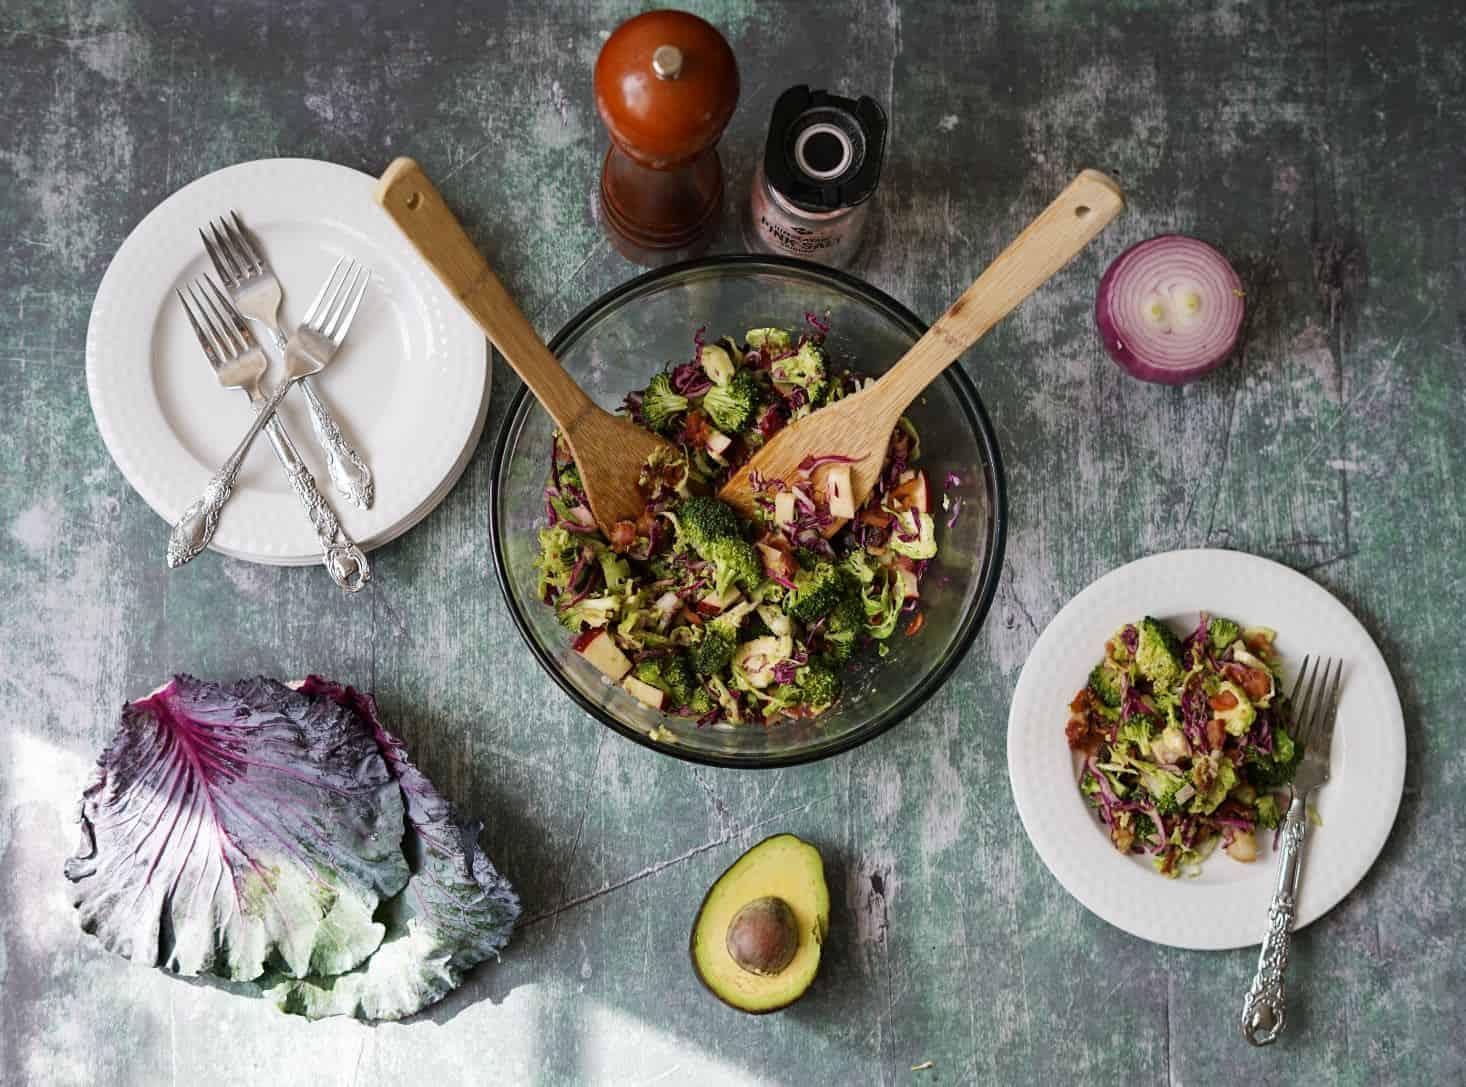 No Mayo Broccoli Salad Recipe Paleo Aip Vegan Option